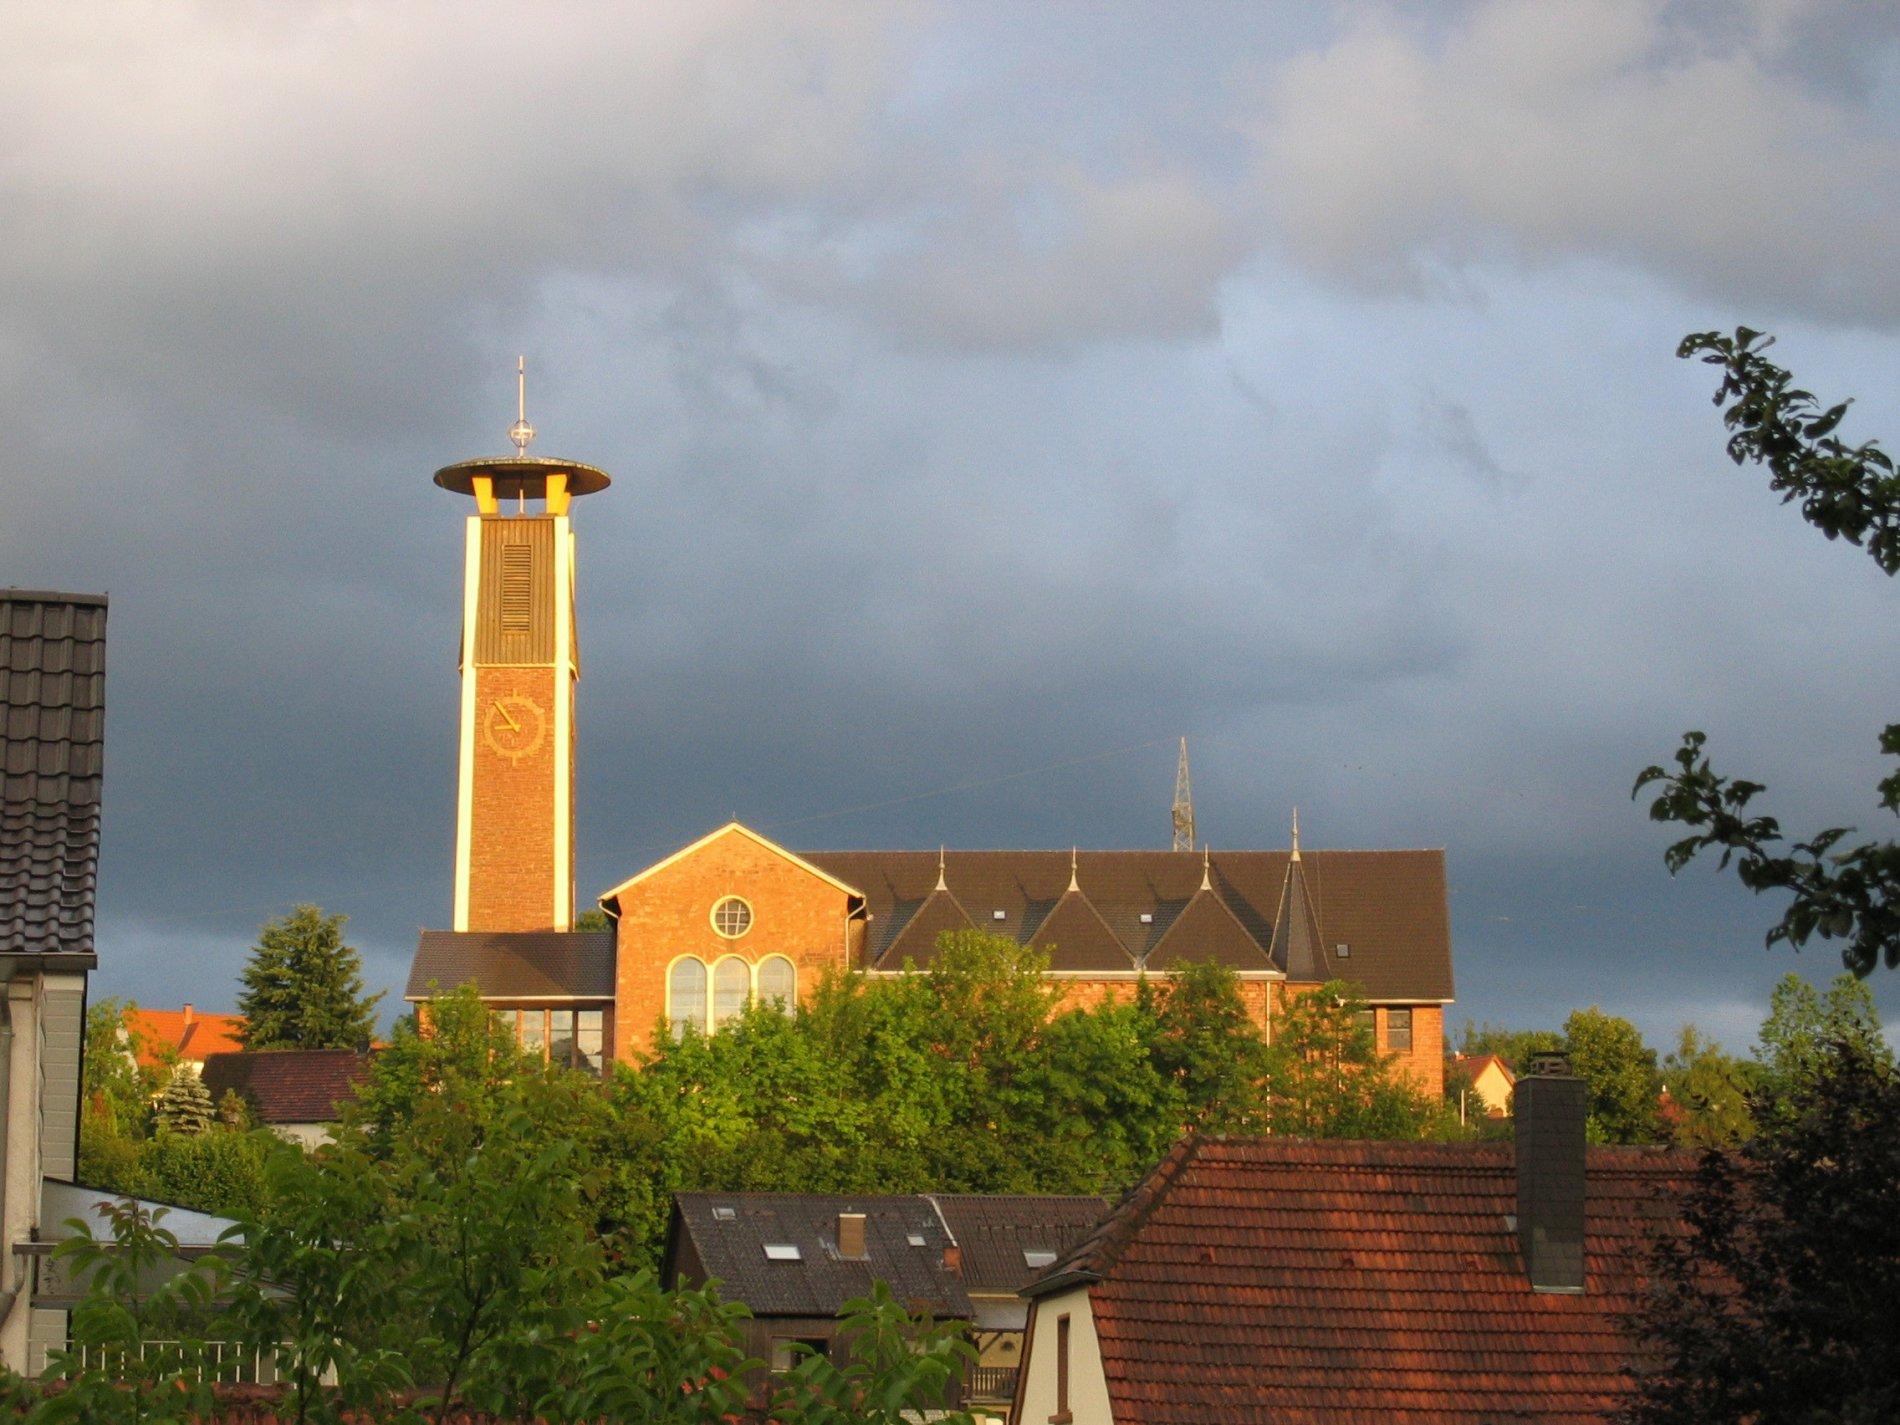 Ausblick auf eien Kirche